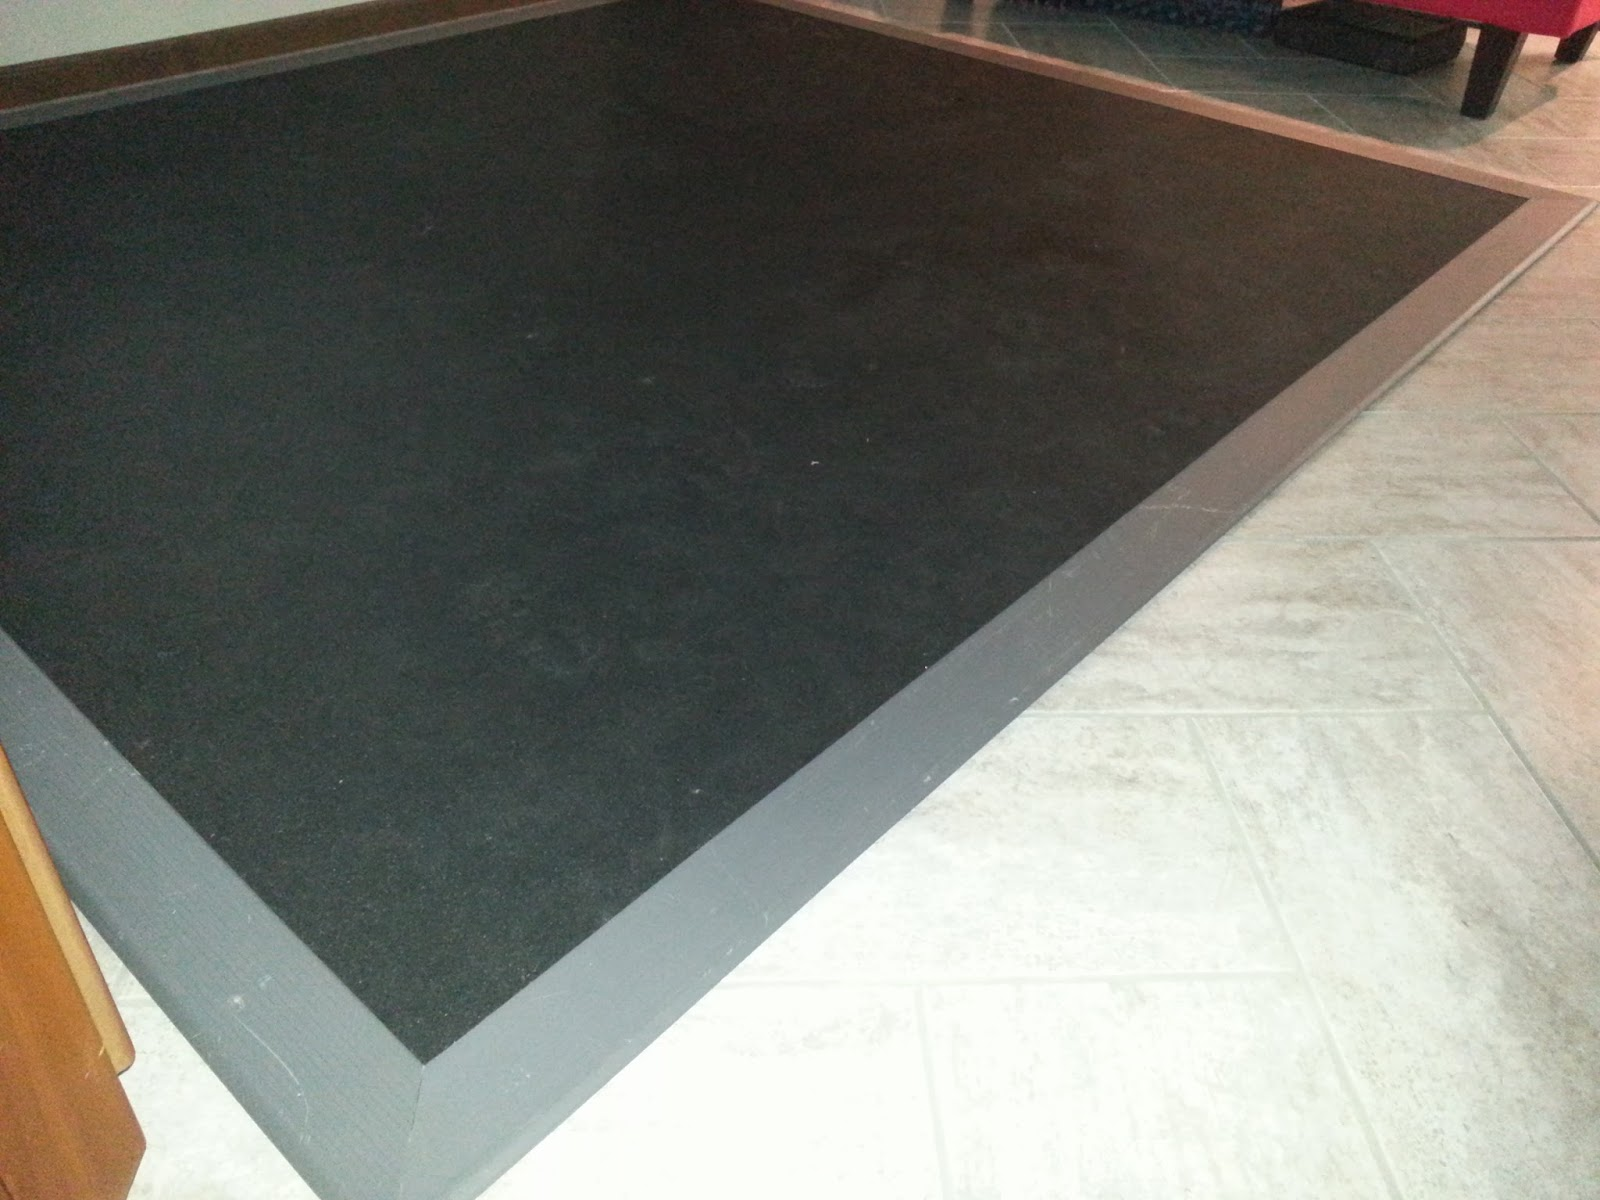 Greatmats Specialty Flooring Mats And Tiles